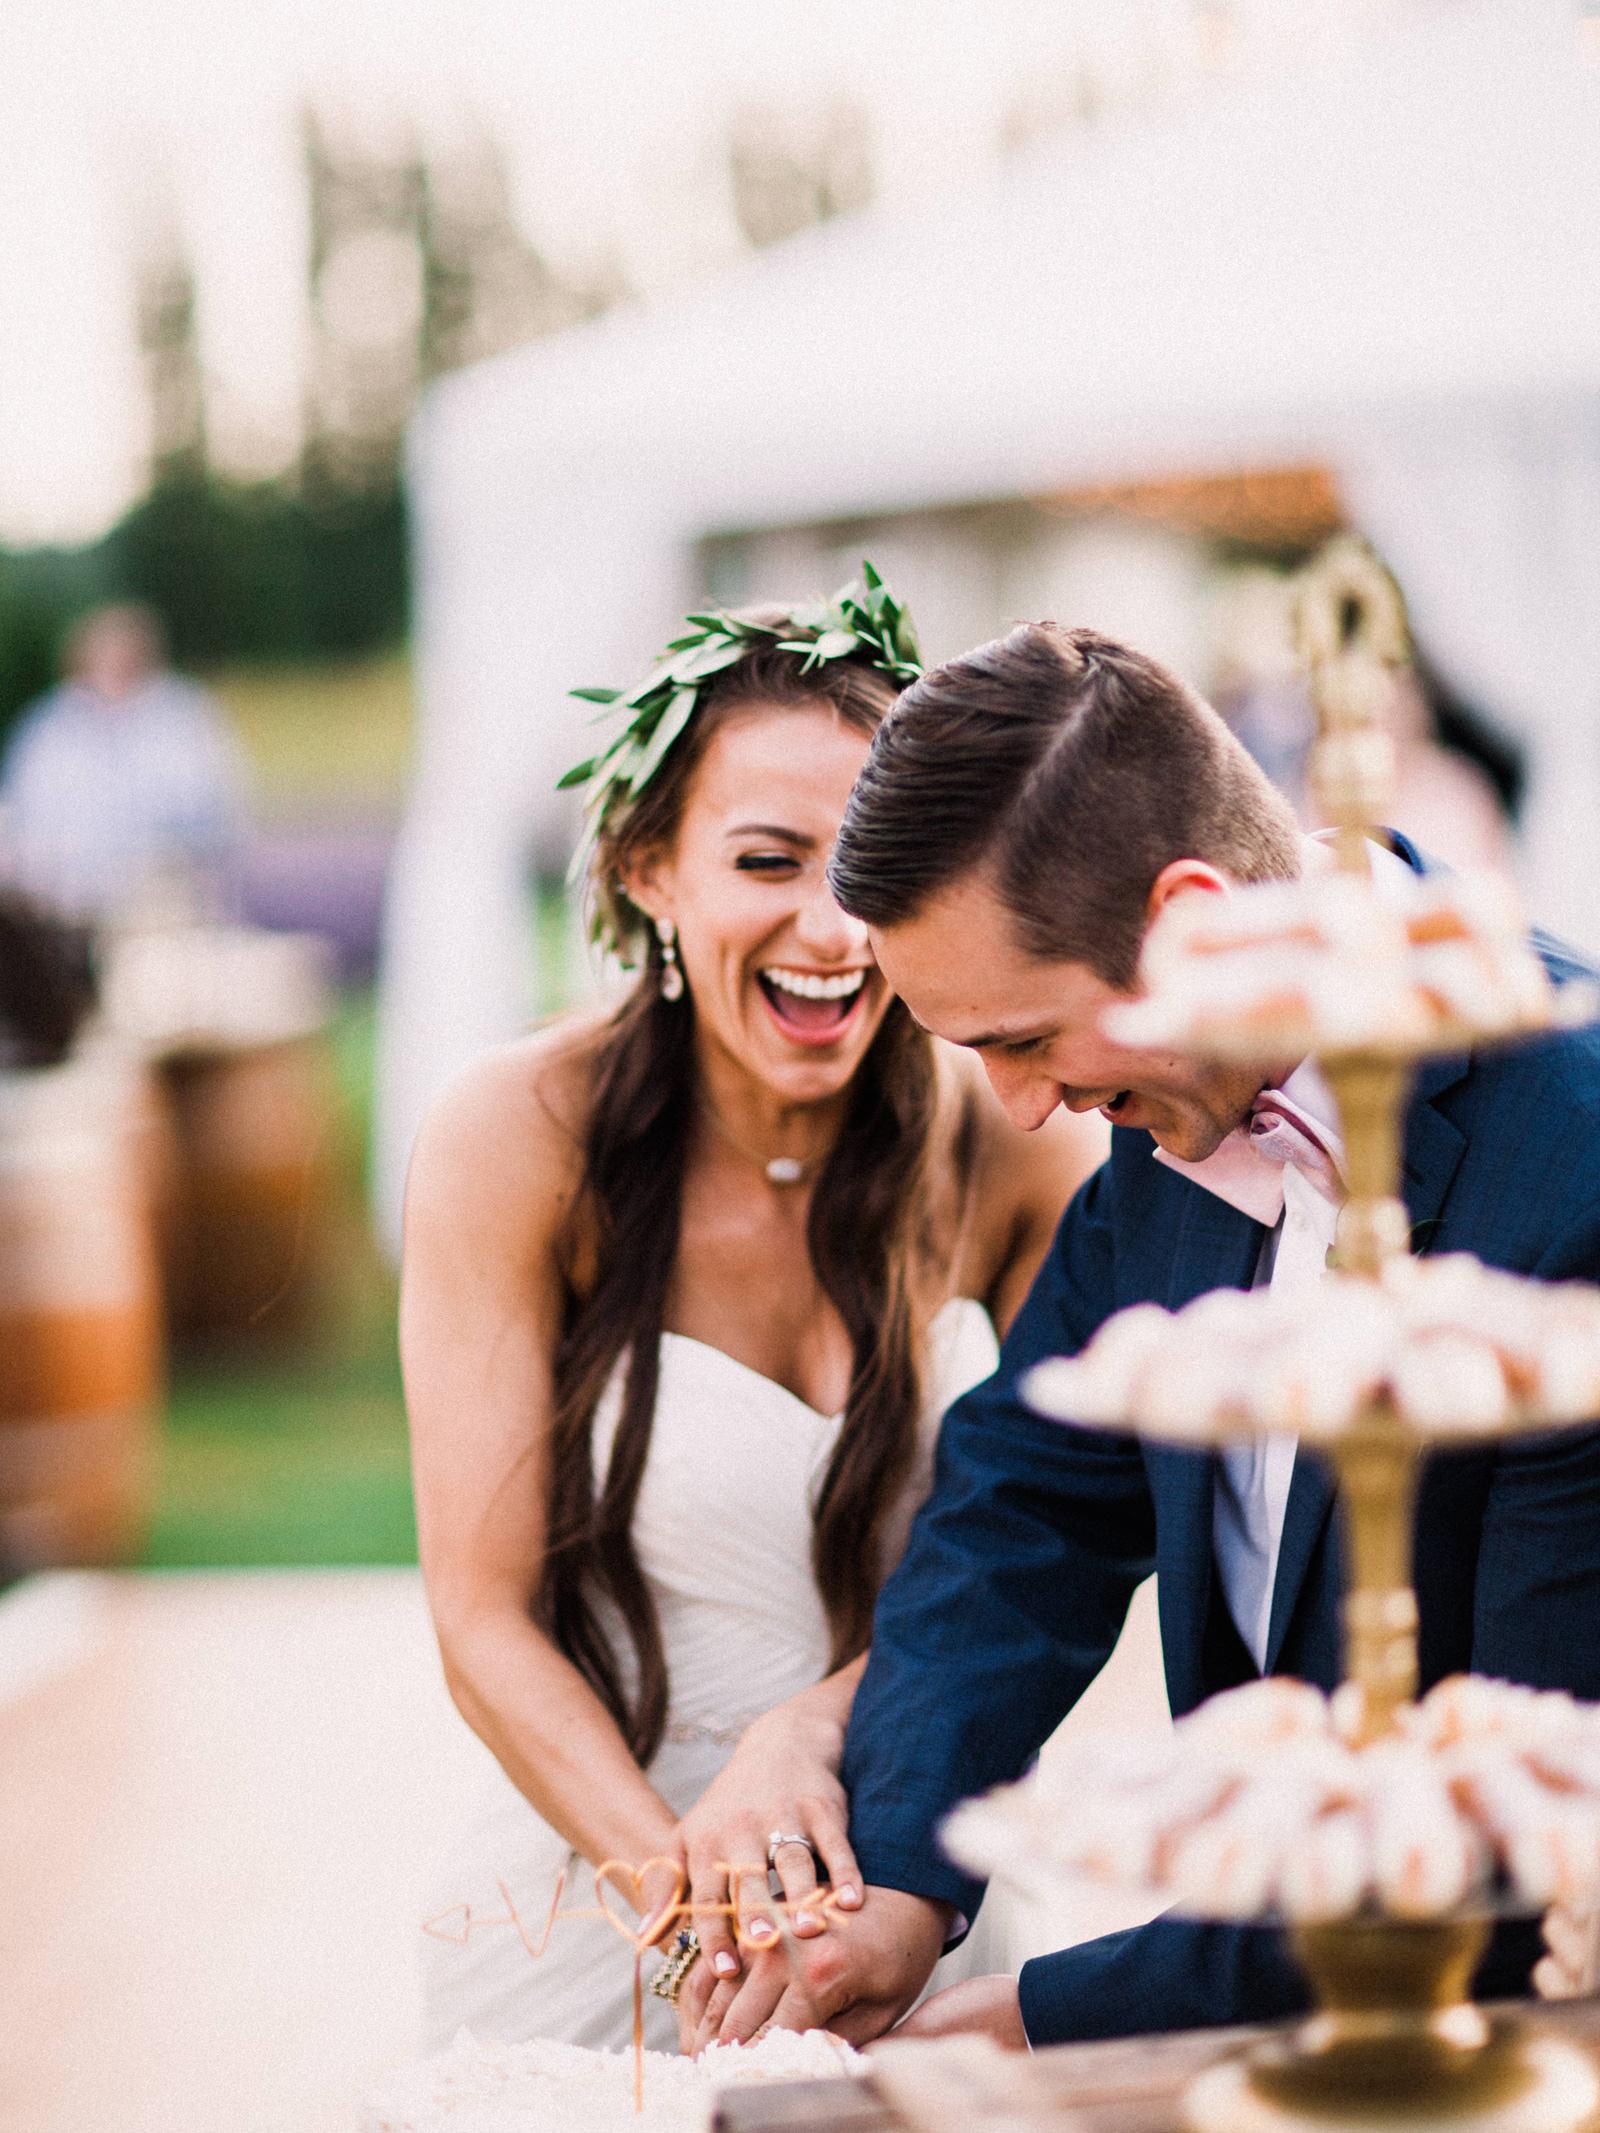 074-woodinville-lavendar-farm-wedding-with-golden-glowy-photos.jpg